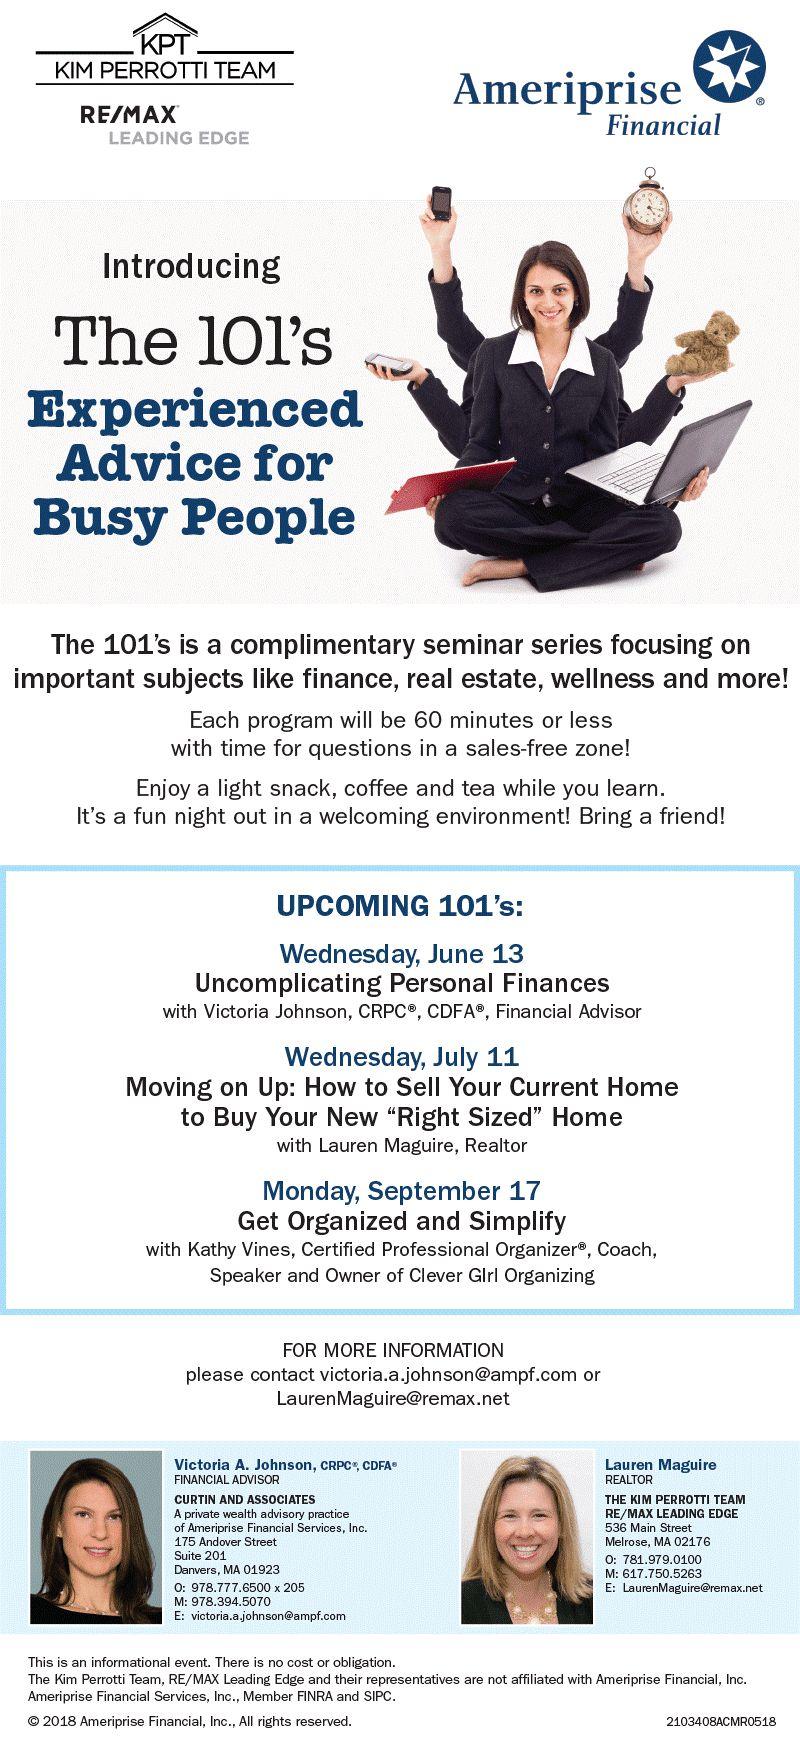 Seminar Series - The 101's